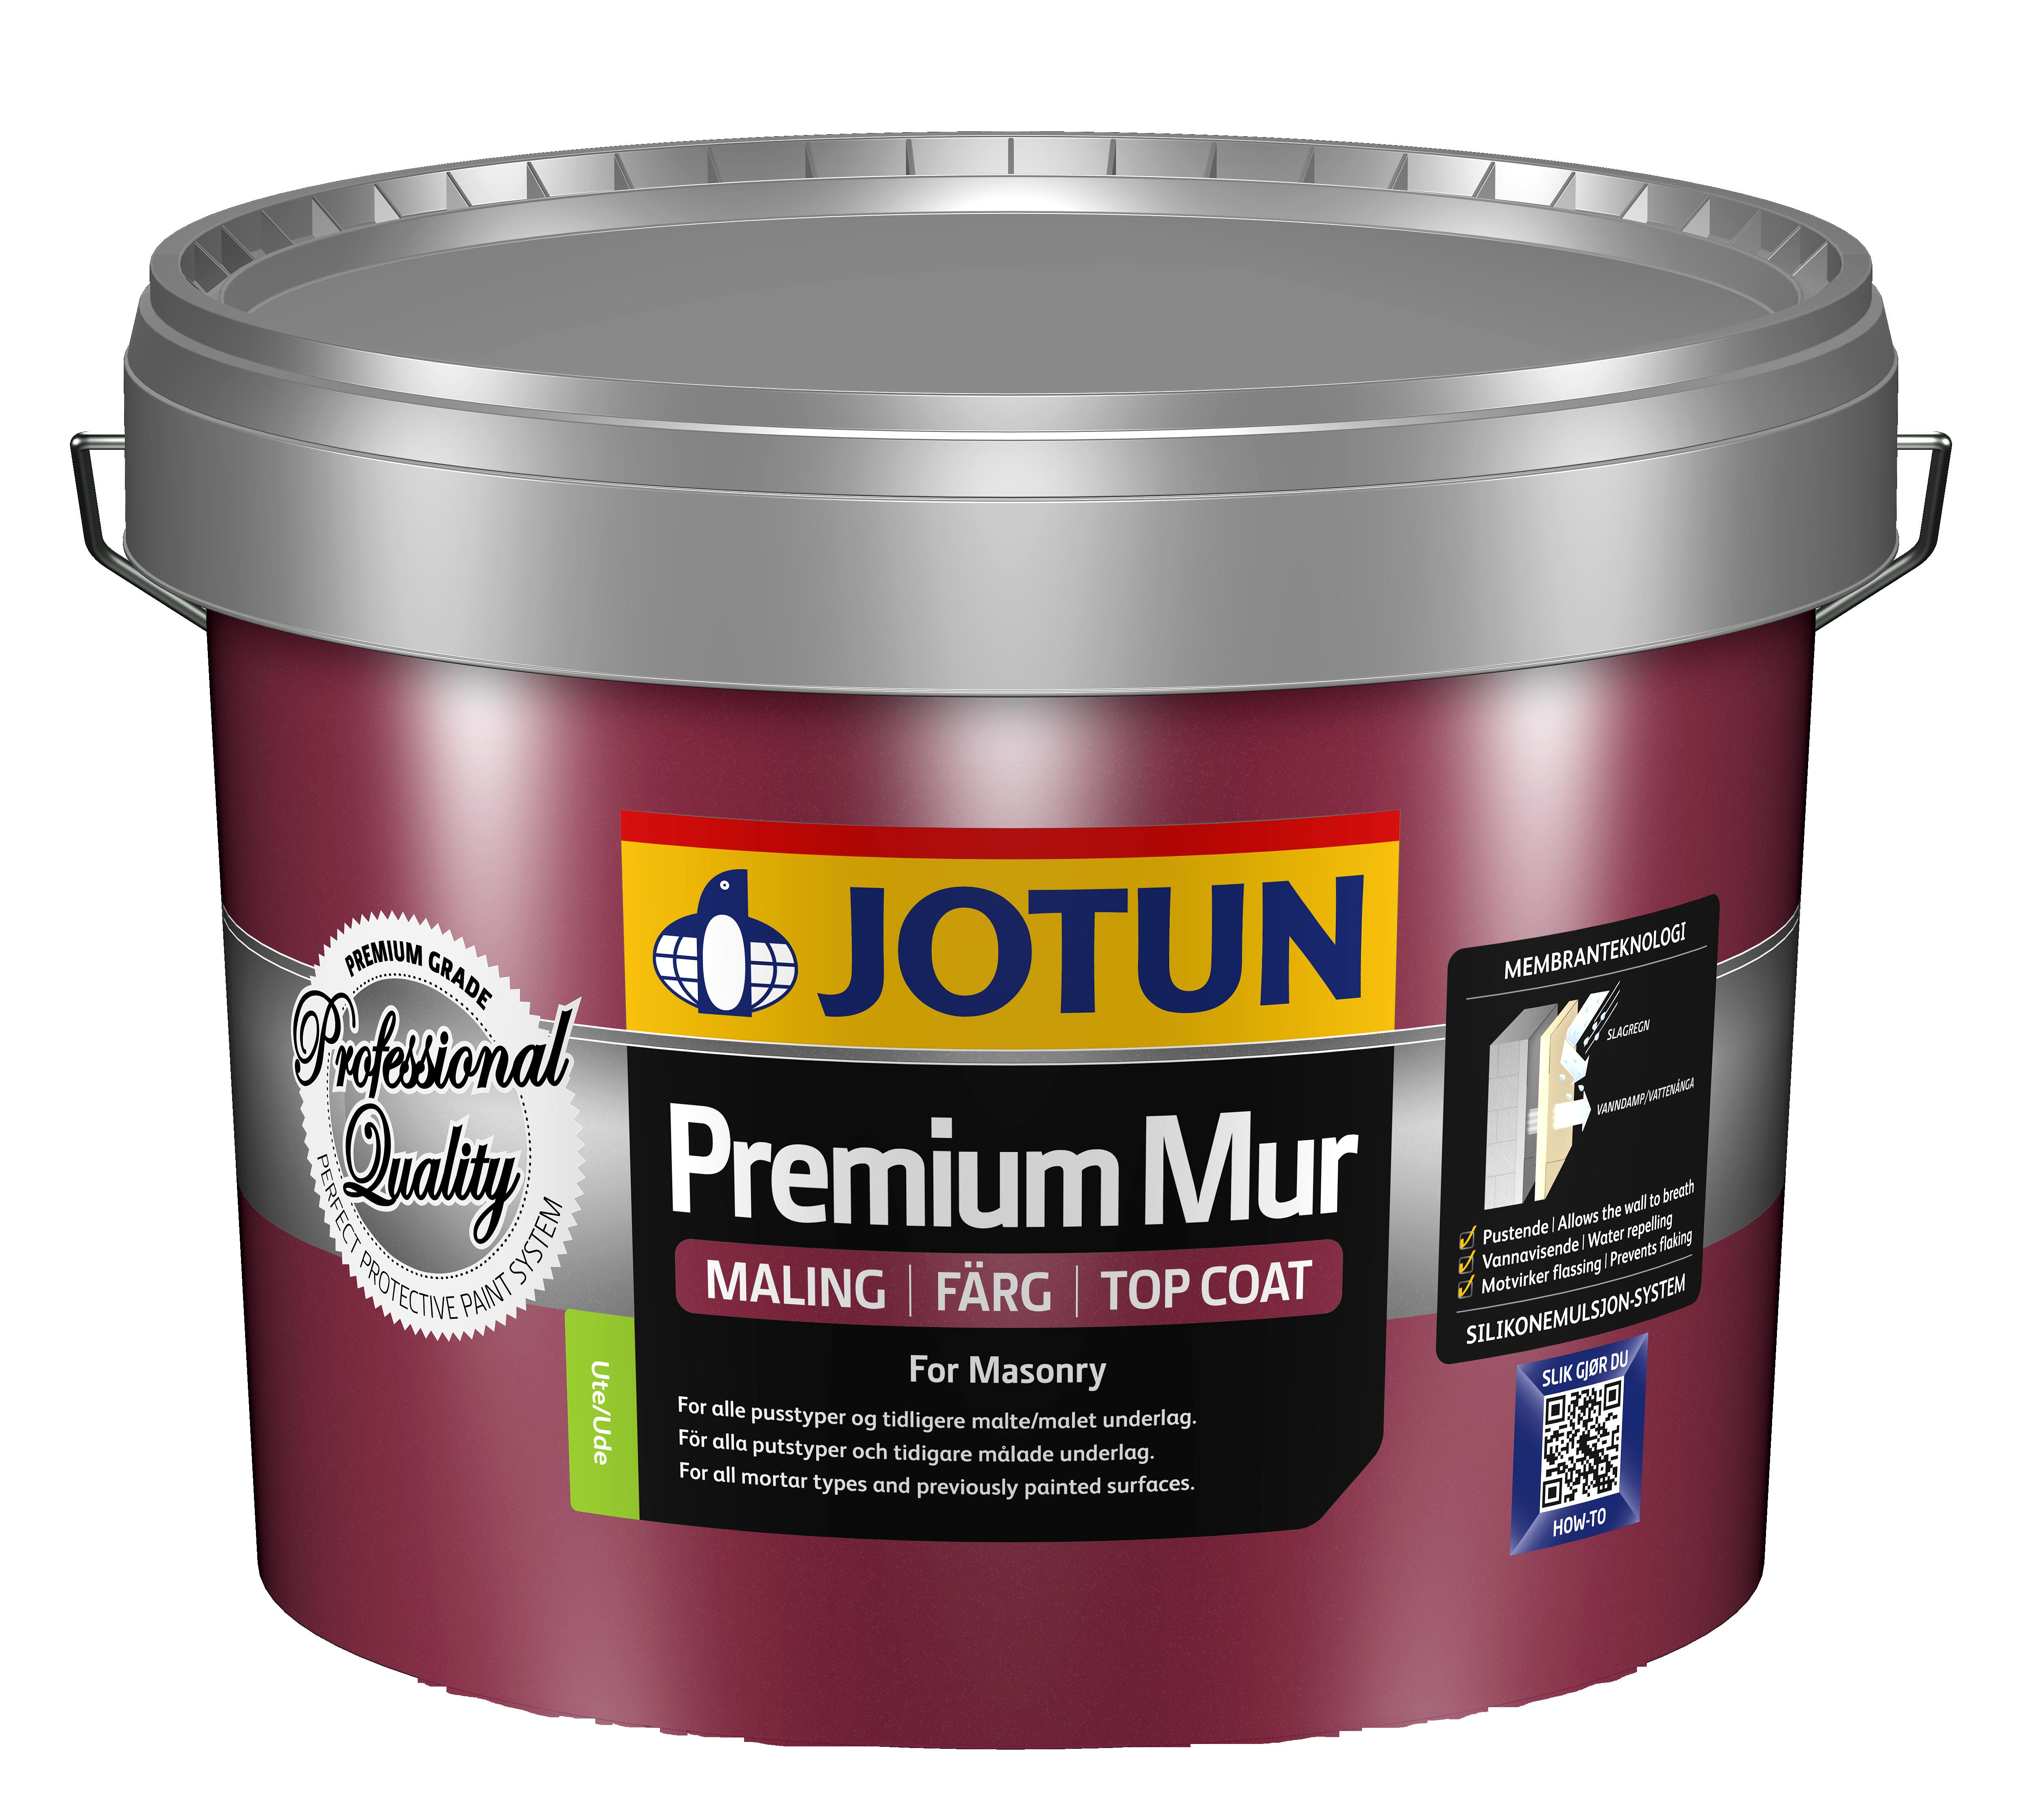 JOTUN Premium Mur färg